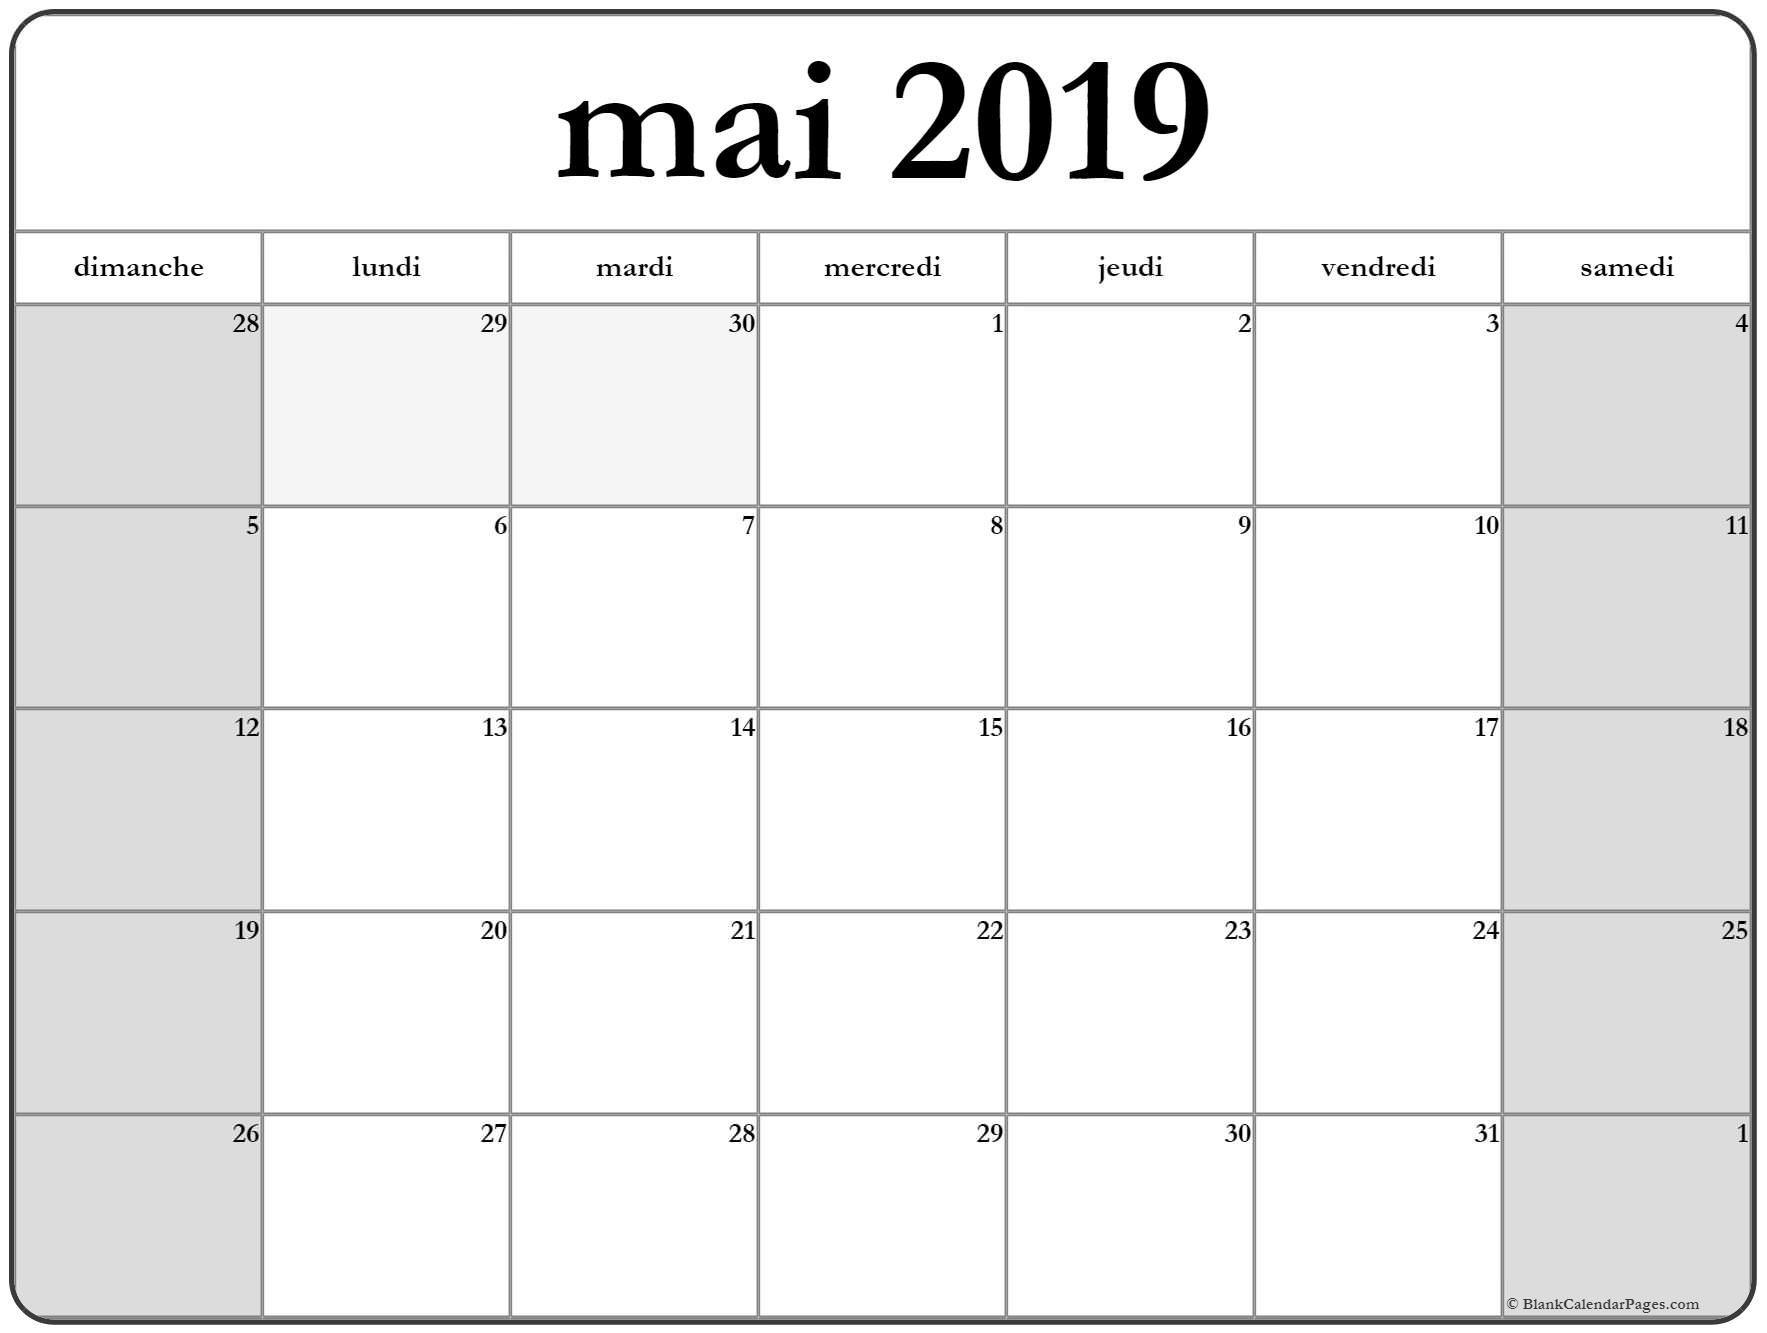 Calendrier Mai2019.Mai 2019 Calendrier Imprimable Calendrier Imprimable